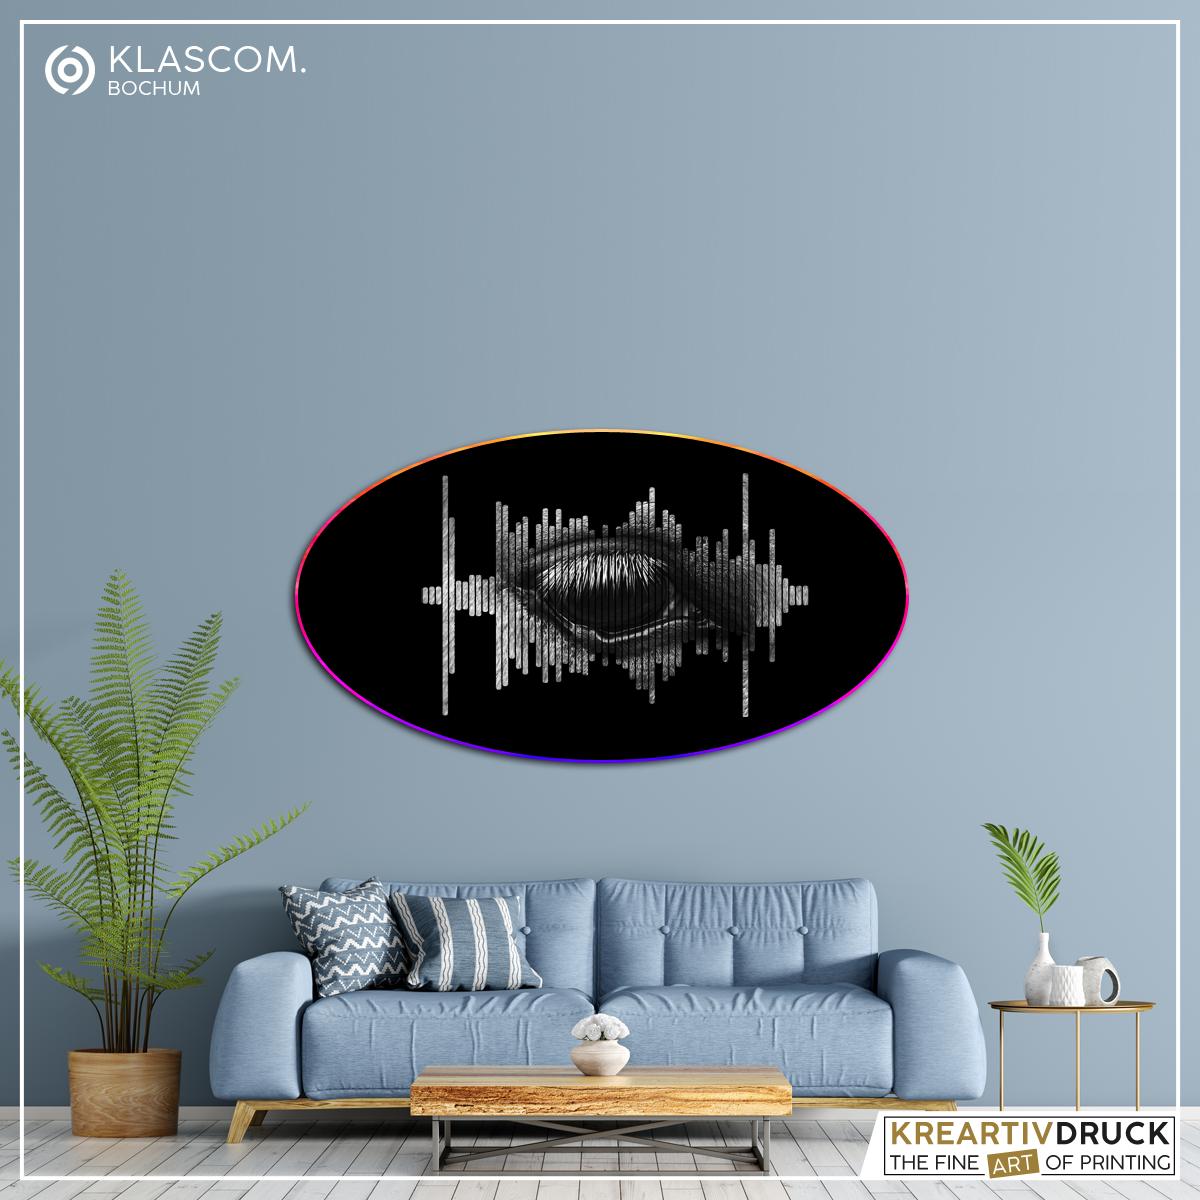 Audiovisual Board SRO, Aluminium-Verbundplatte, oval, farbiger Hintergrund